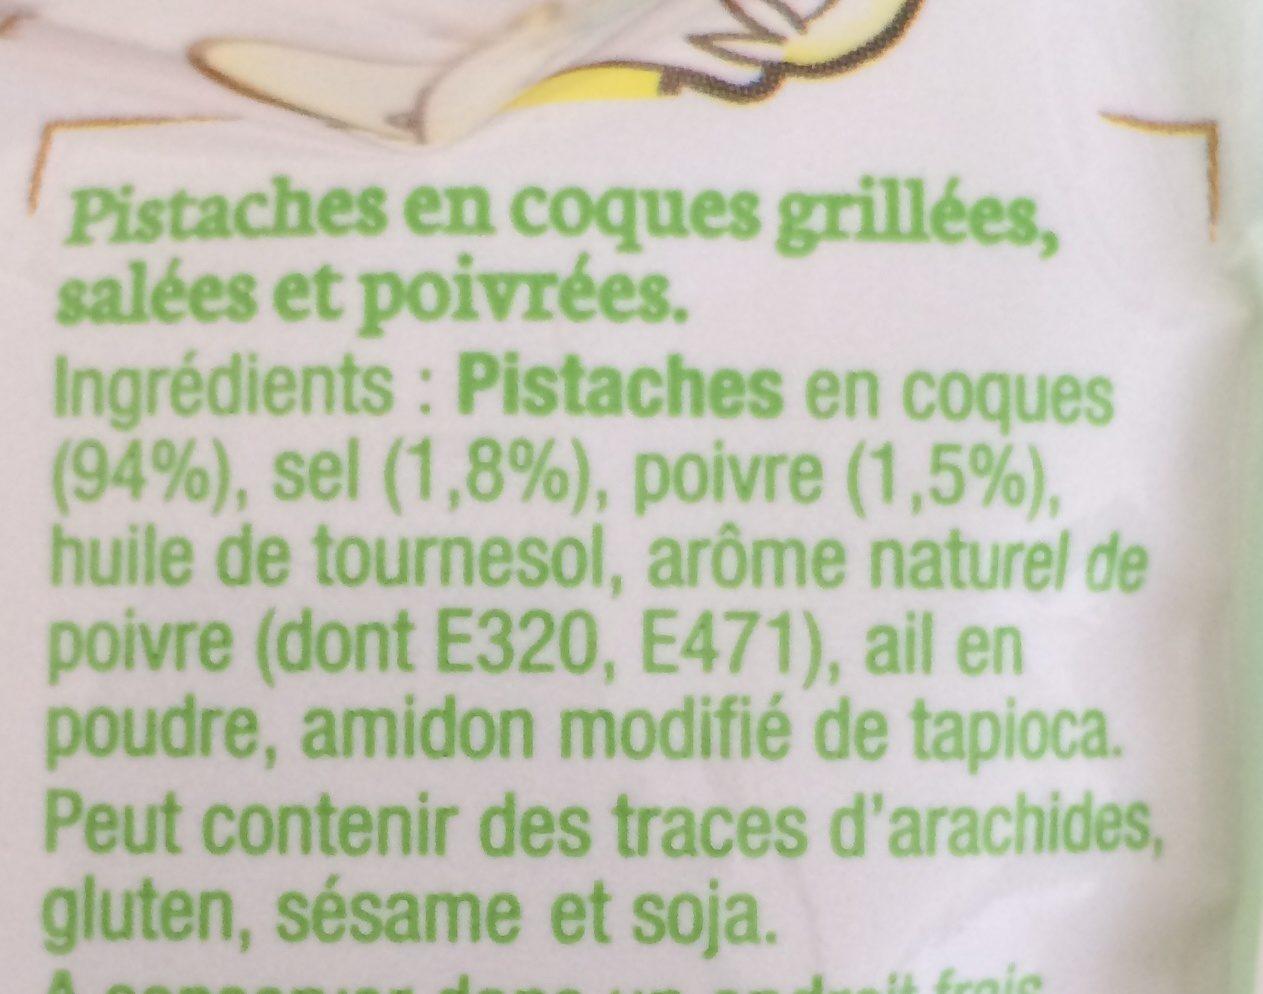 Pistaches grillées sel et poivre - Ingrediënten - fr